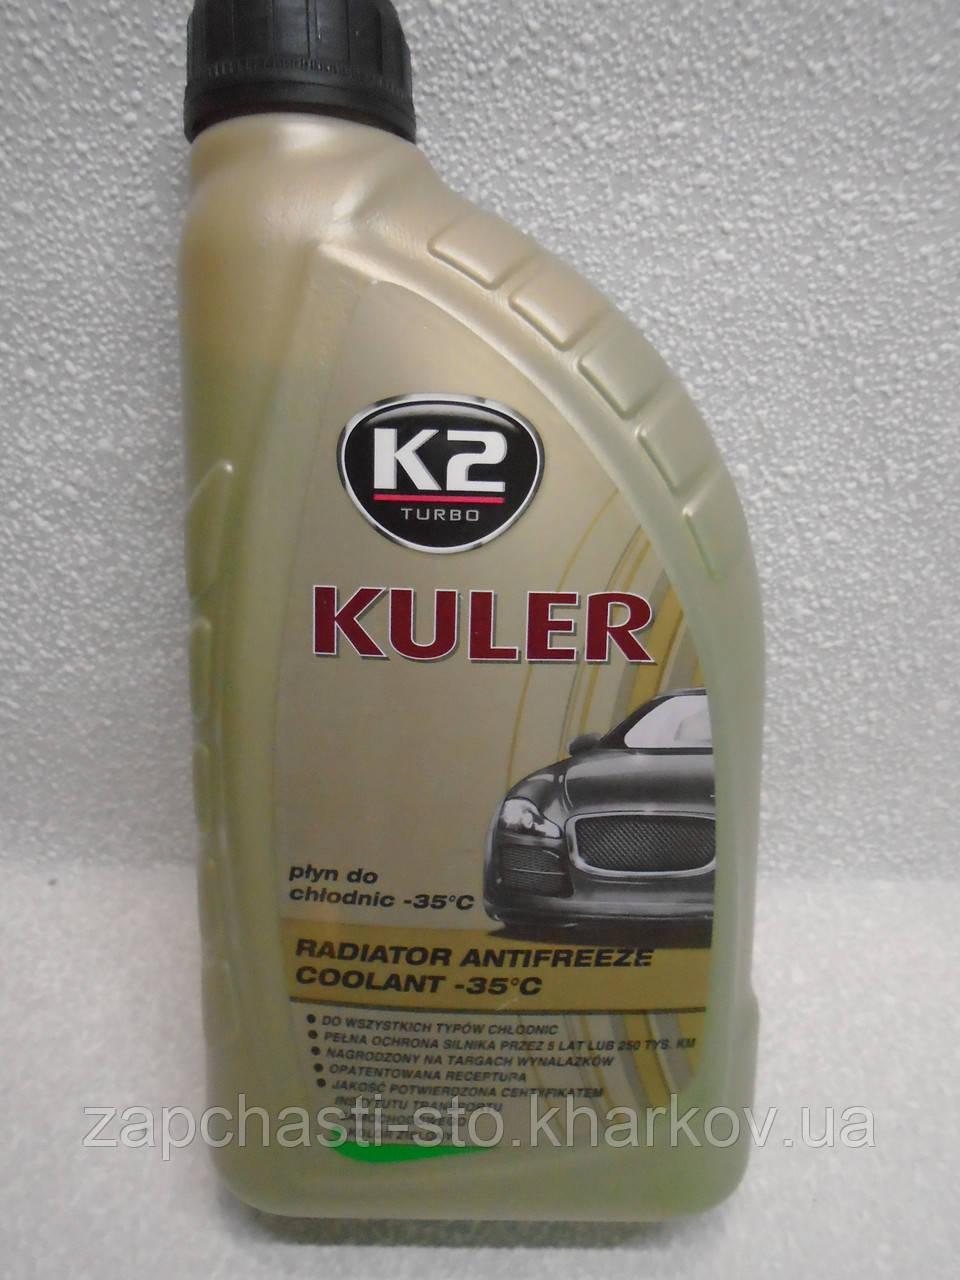 Антифриз зеленый K2 Kuler 1л -35